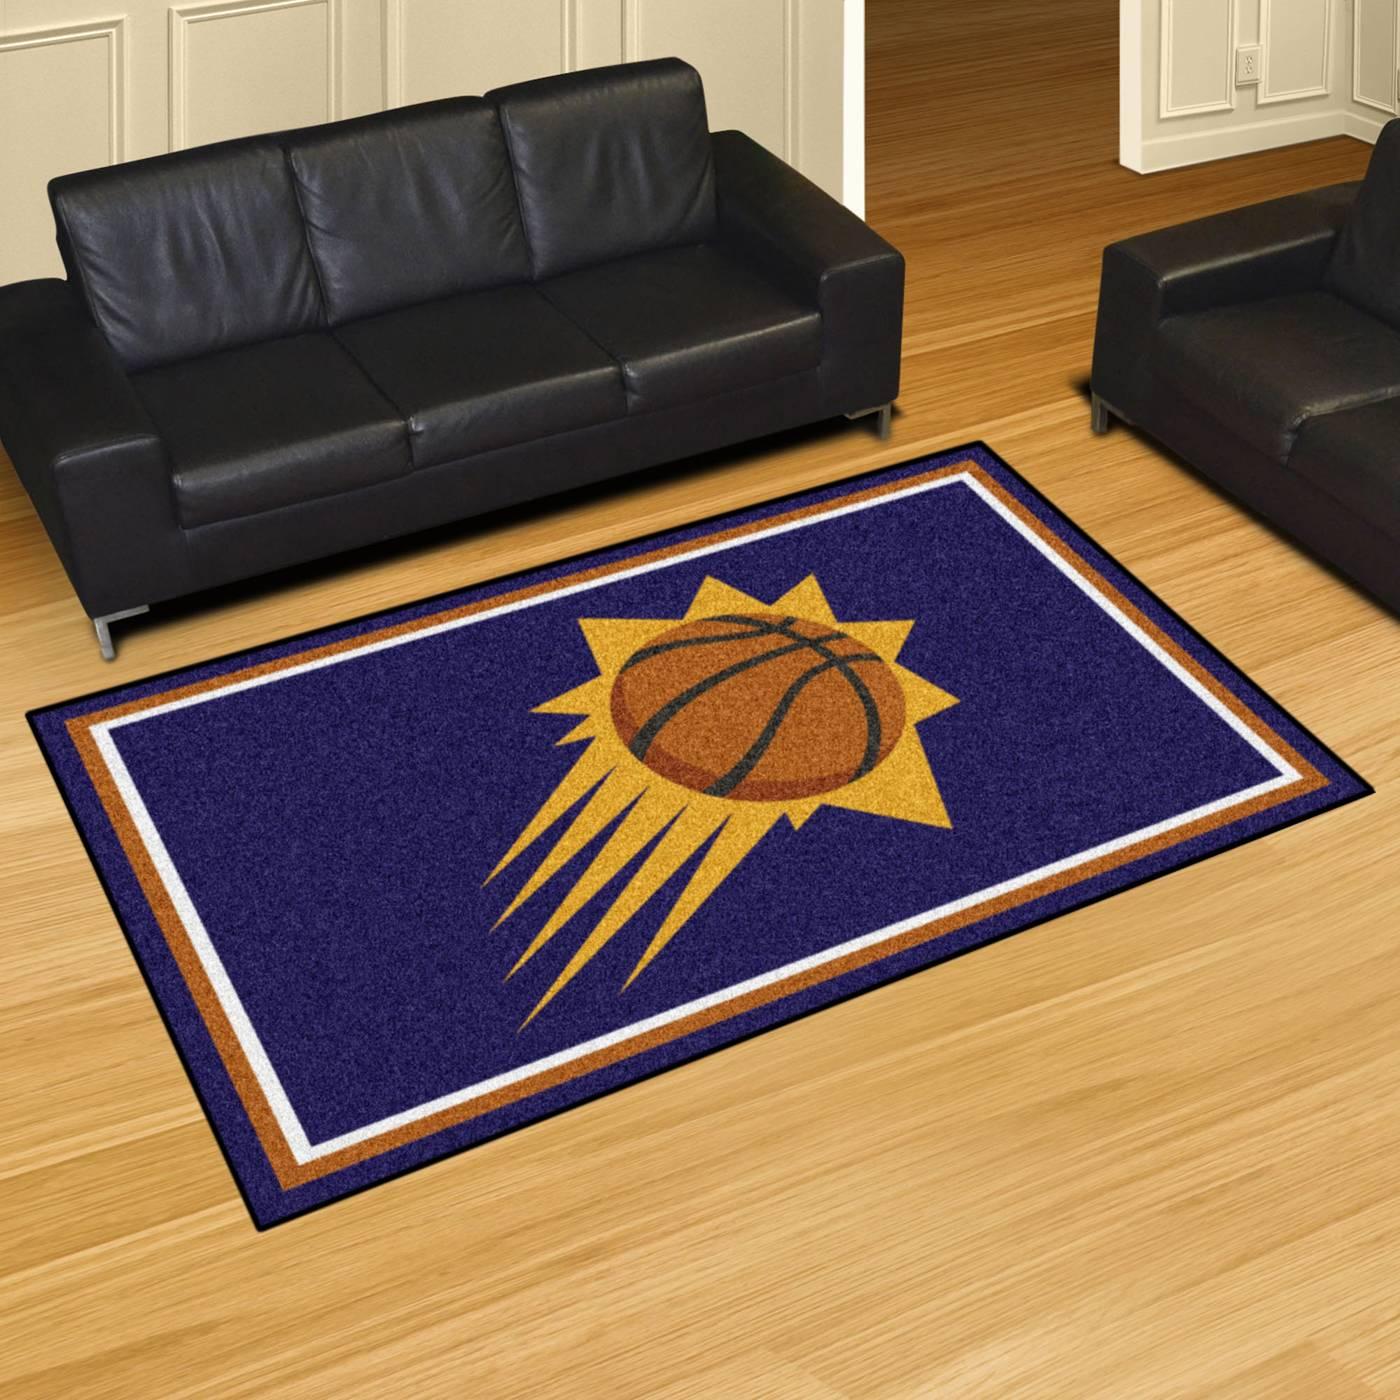 Basketball Rug Target: Phoenix Suns 4' X 6' Area Rug